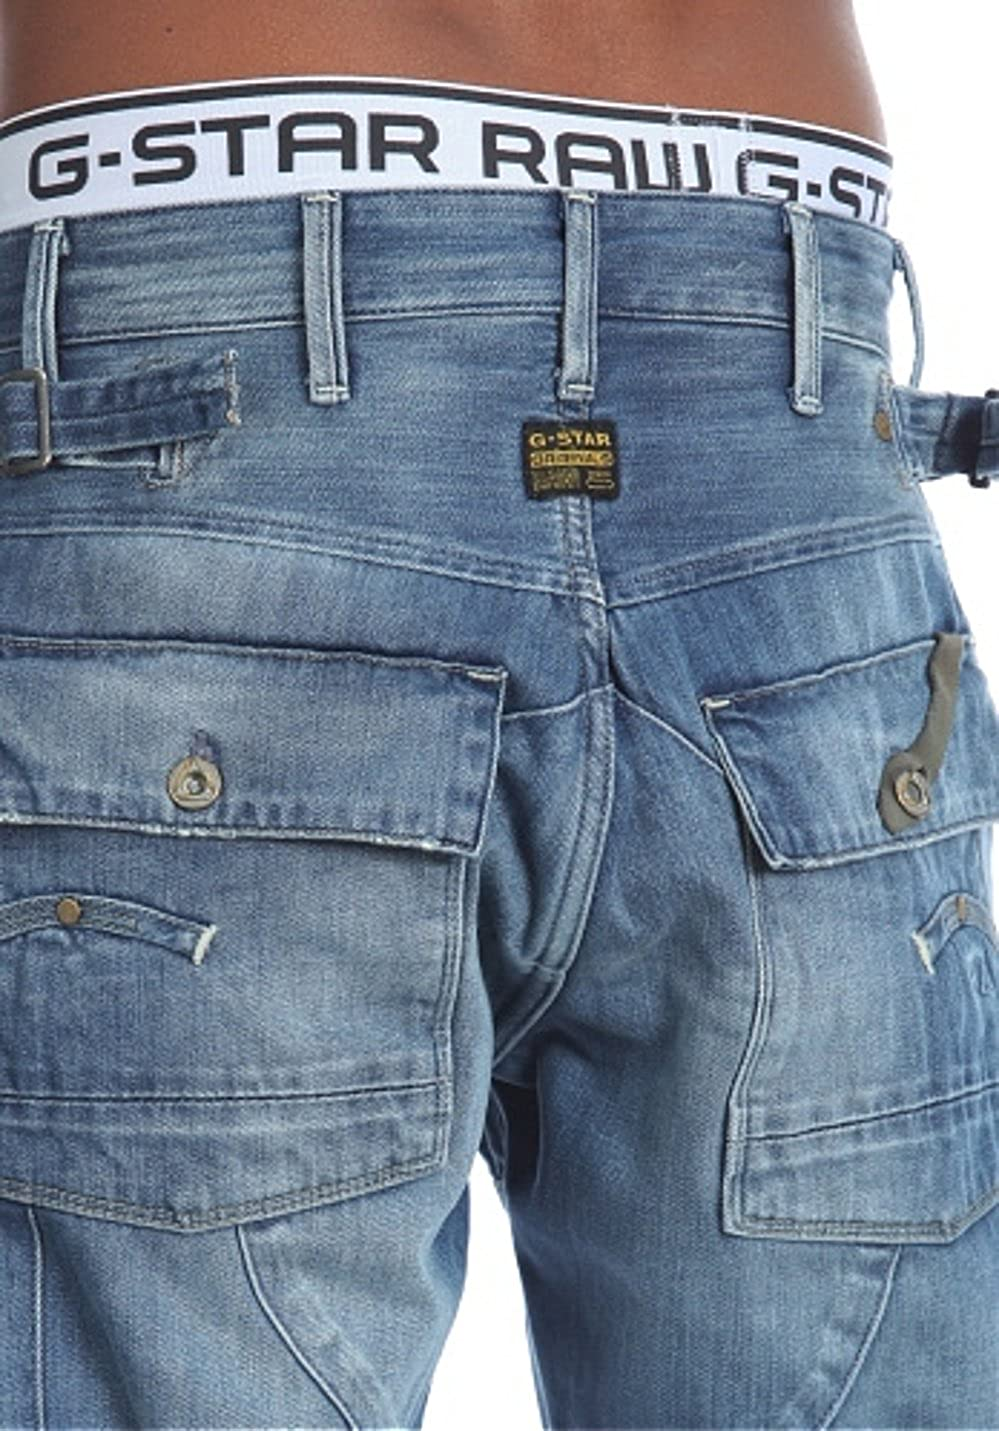 d1de10cbe0f G-STAR Herren Loose Jeans Trail 5620 Loose, denim, Gr. 30/32: Amazon.de:  Bekleidung